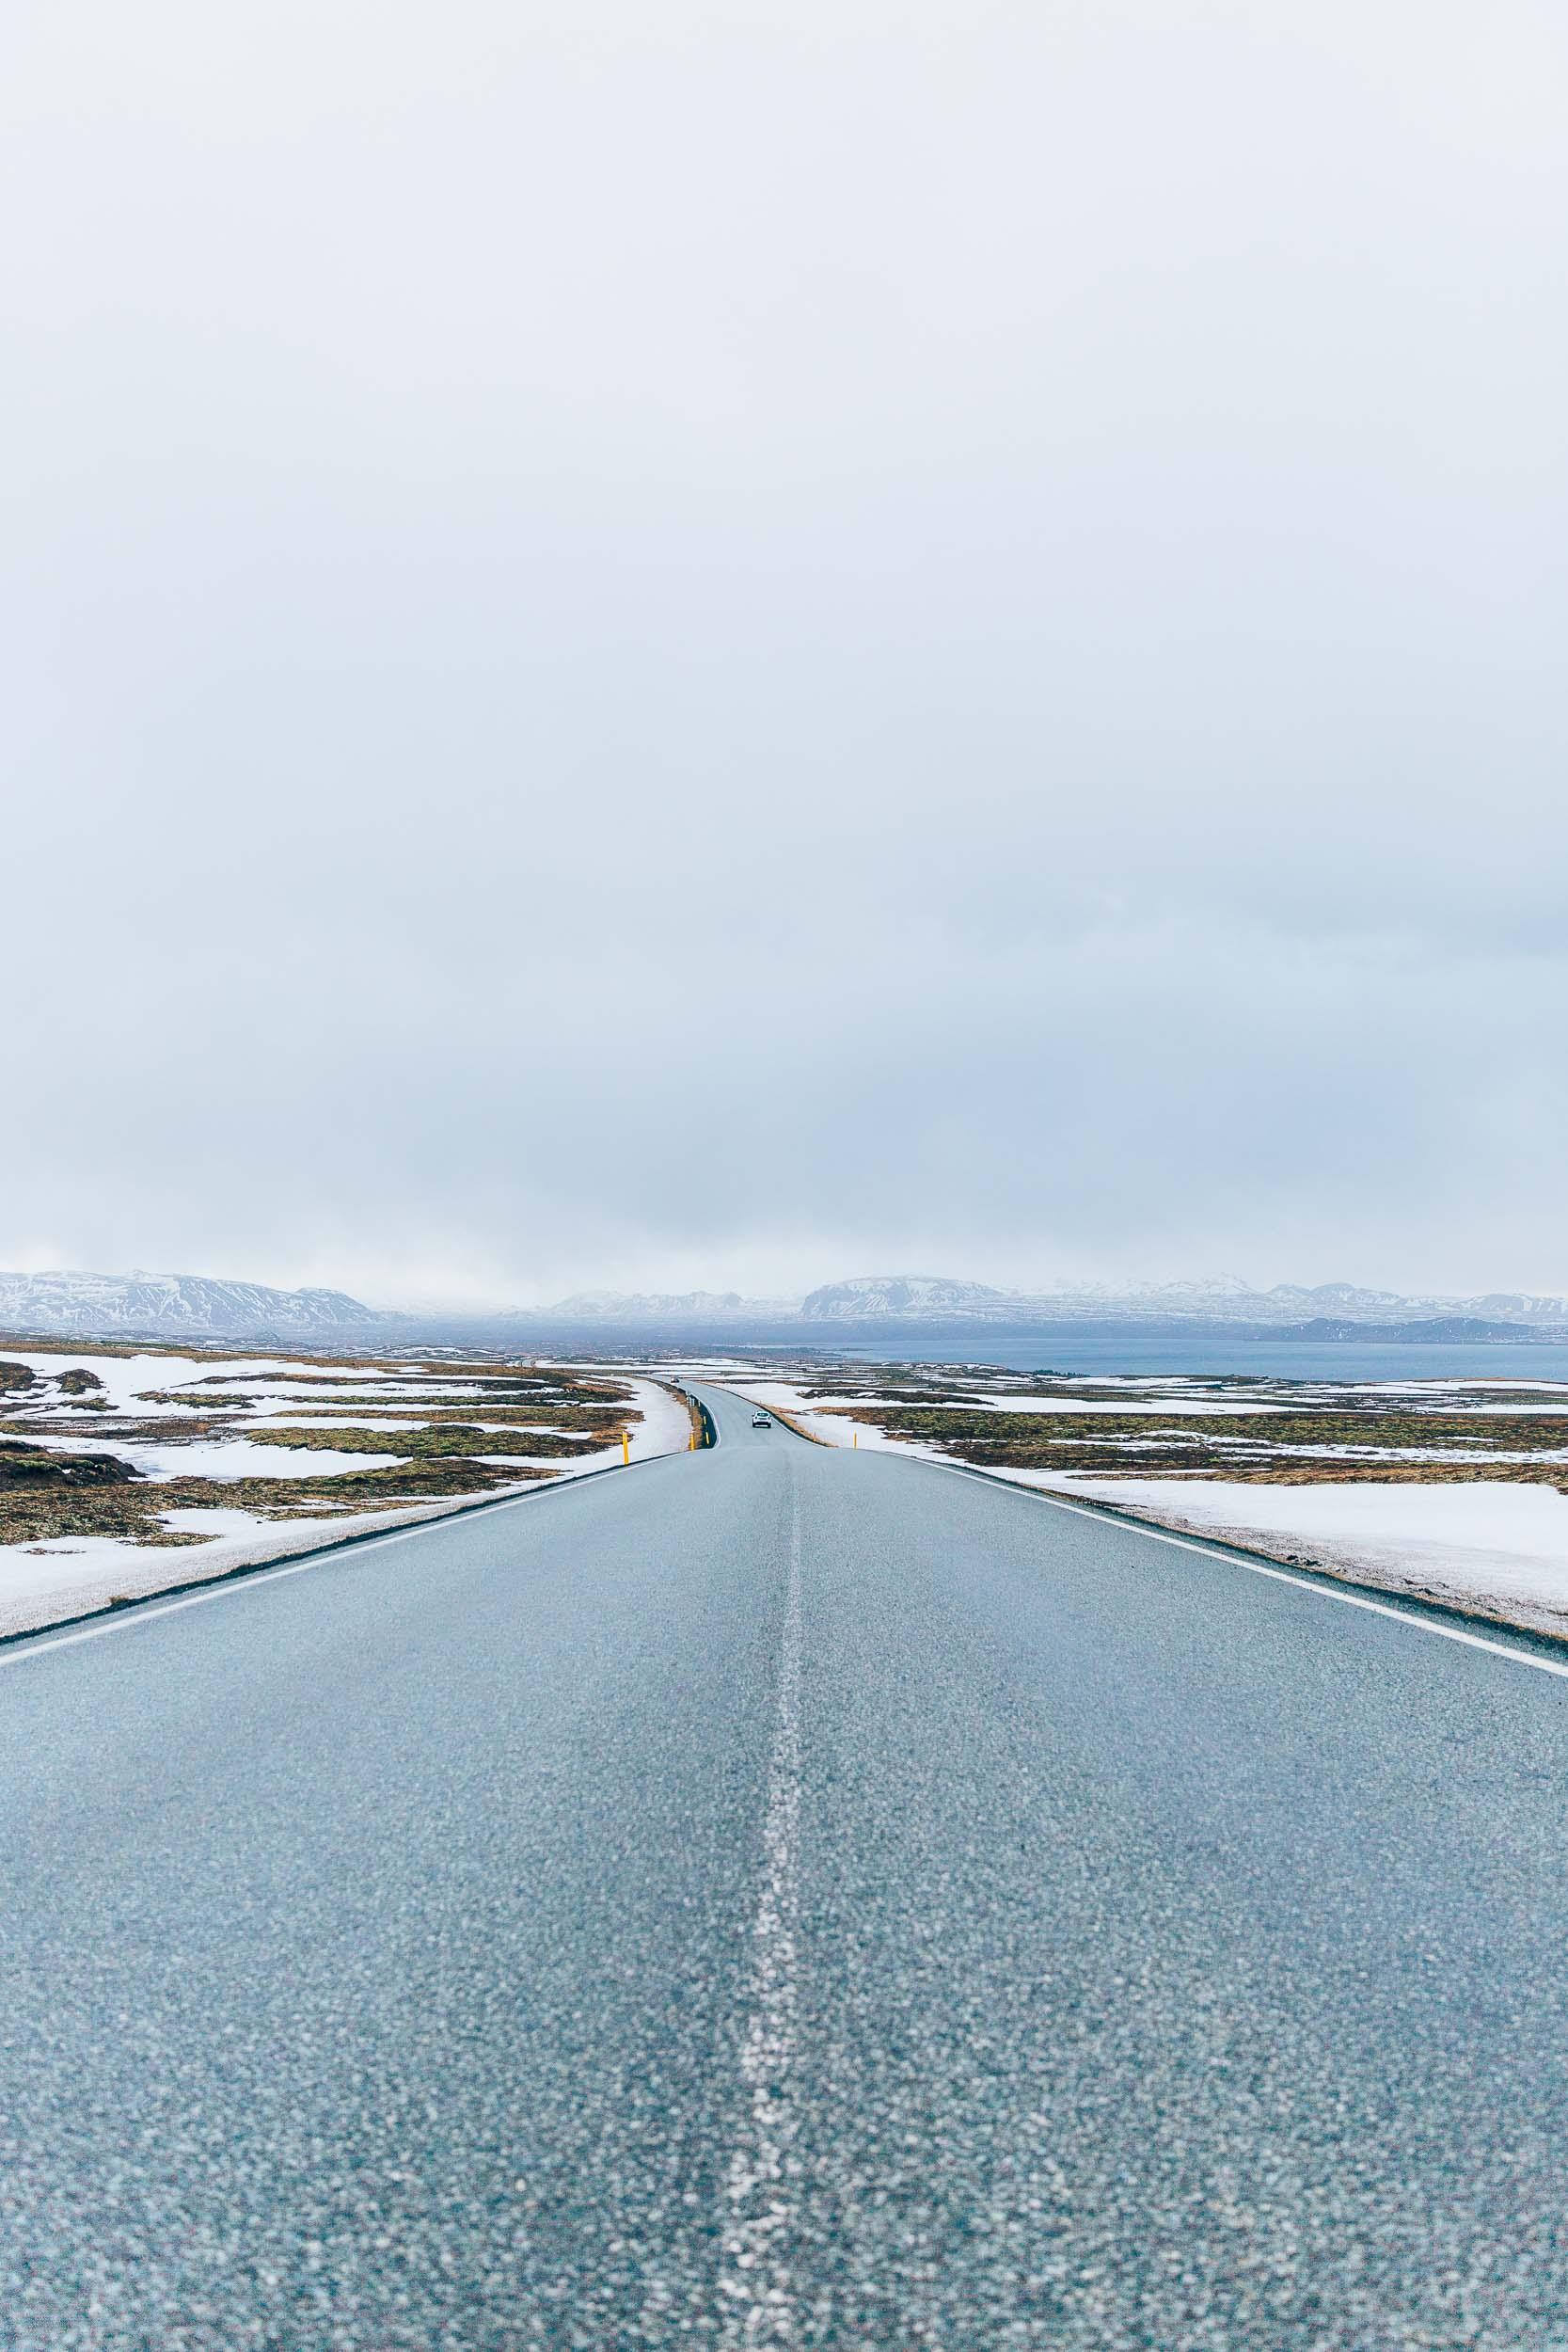 02_2019_Iceland-255.jpg